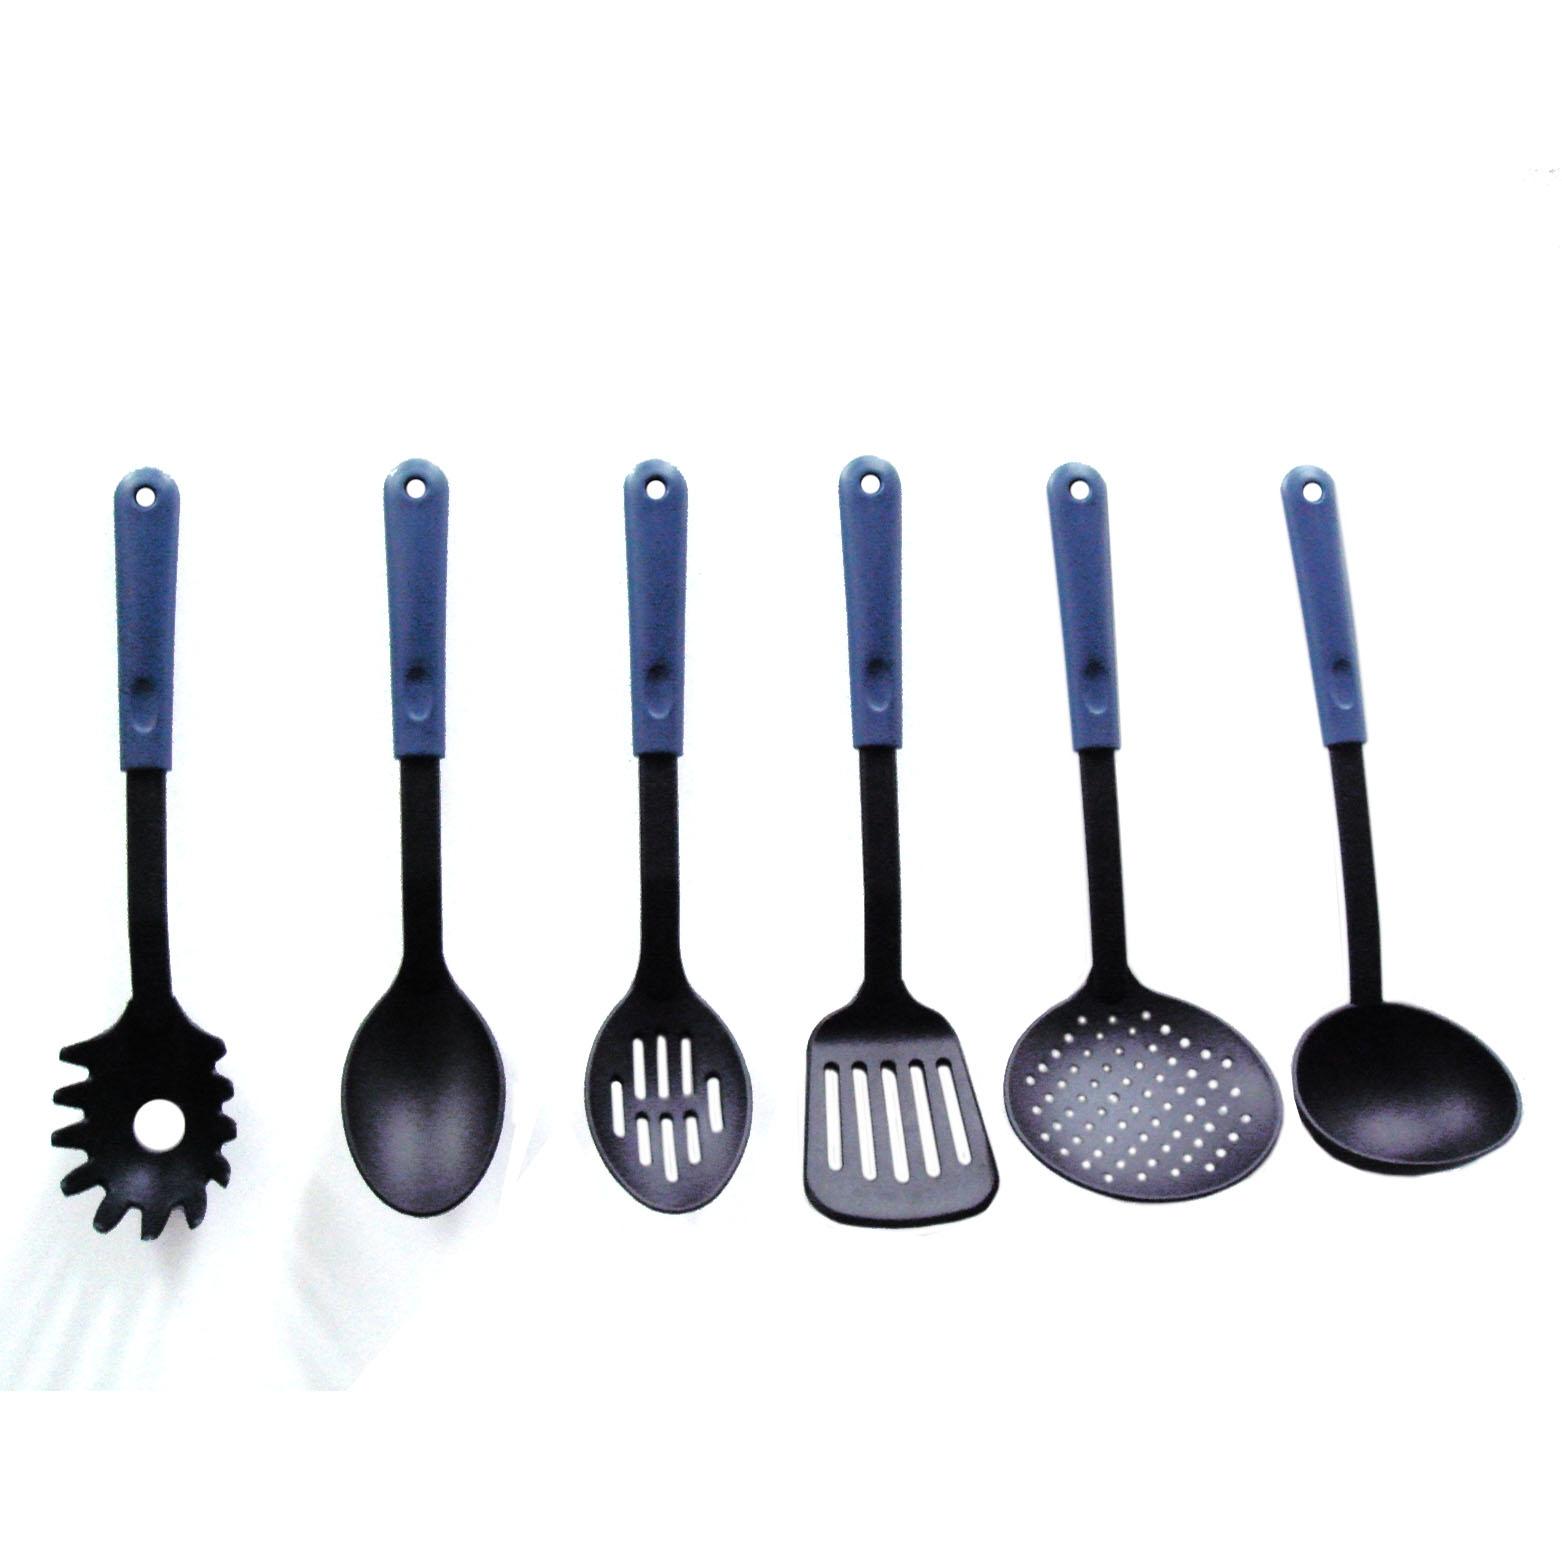 Nylon utensilios de cocina utensilios identificaci n del for Kitchen utensils in spanish